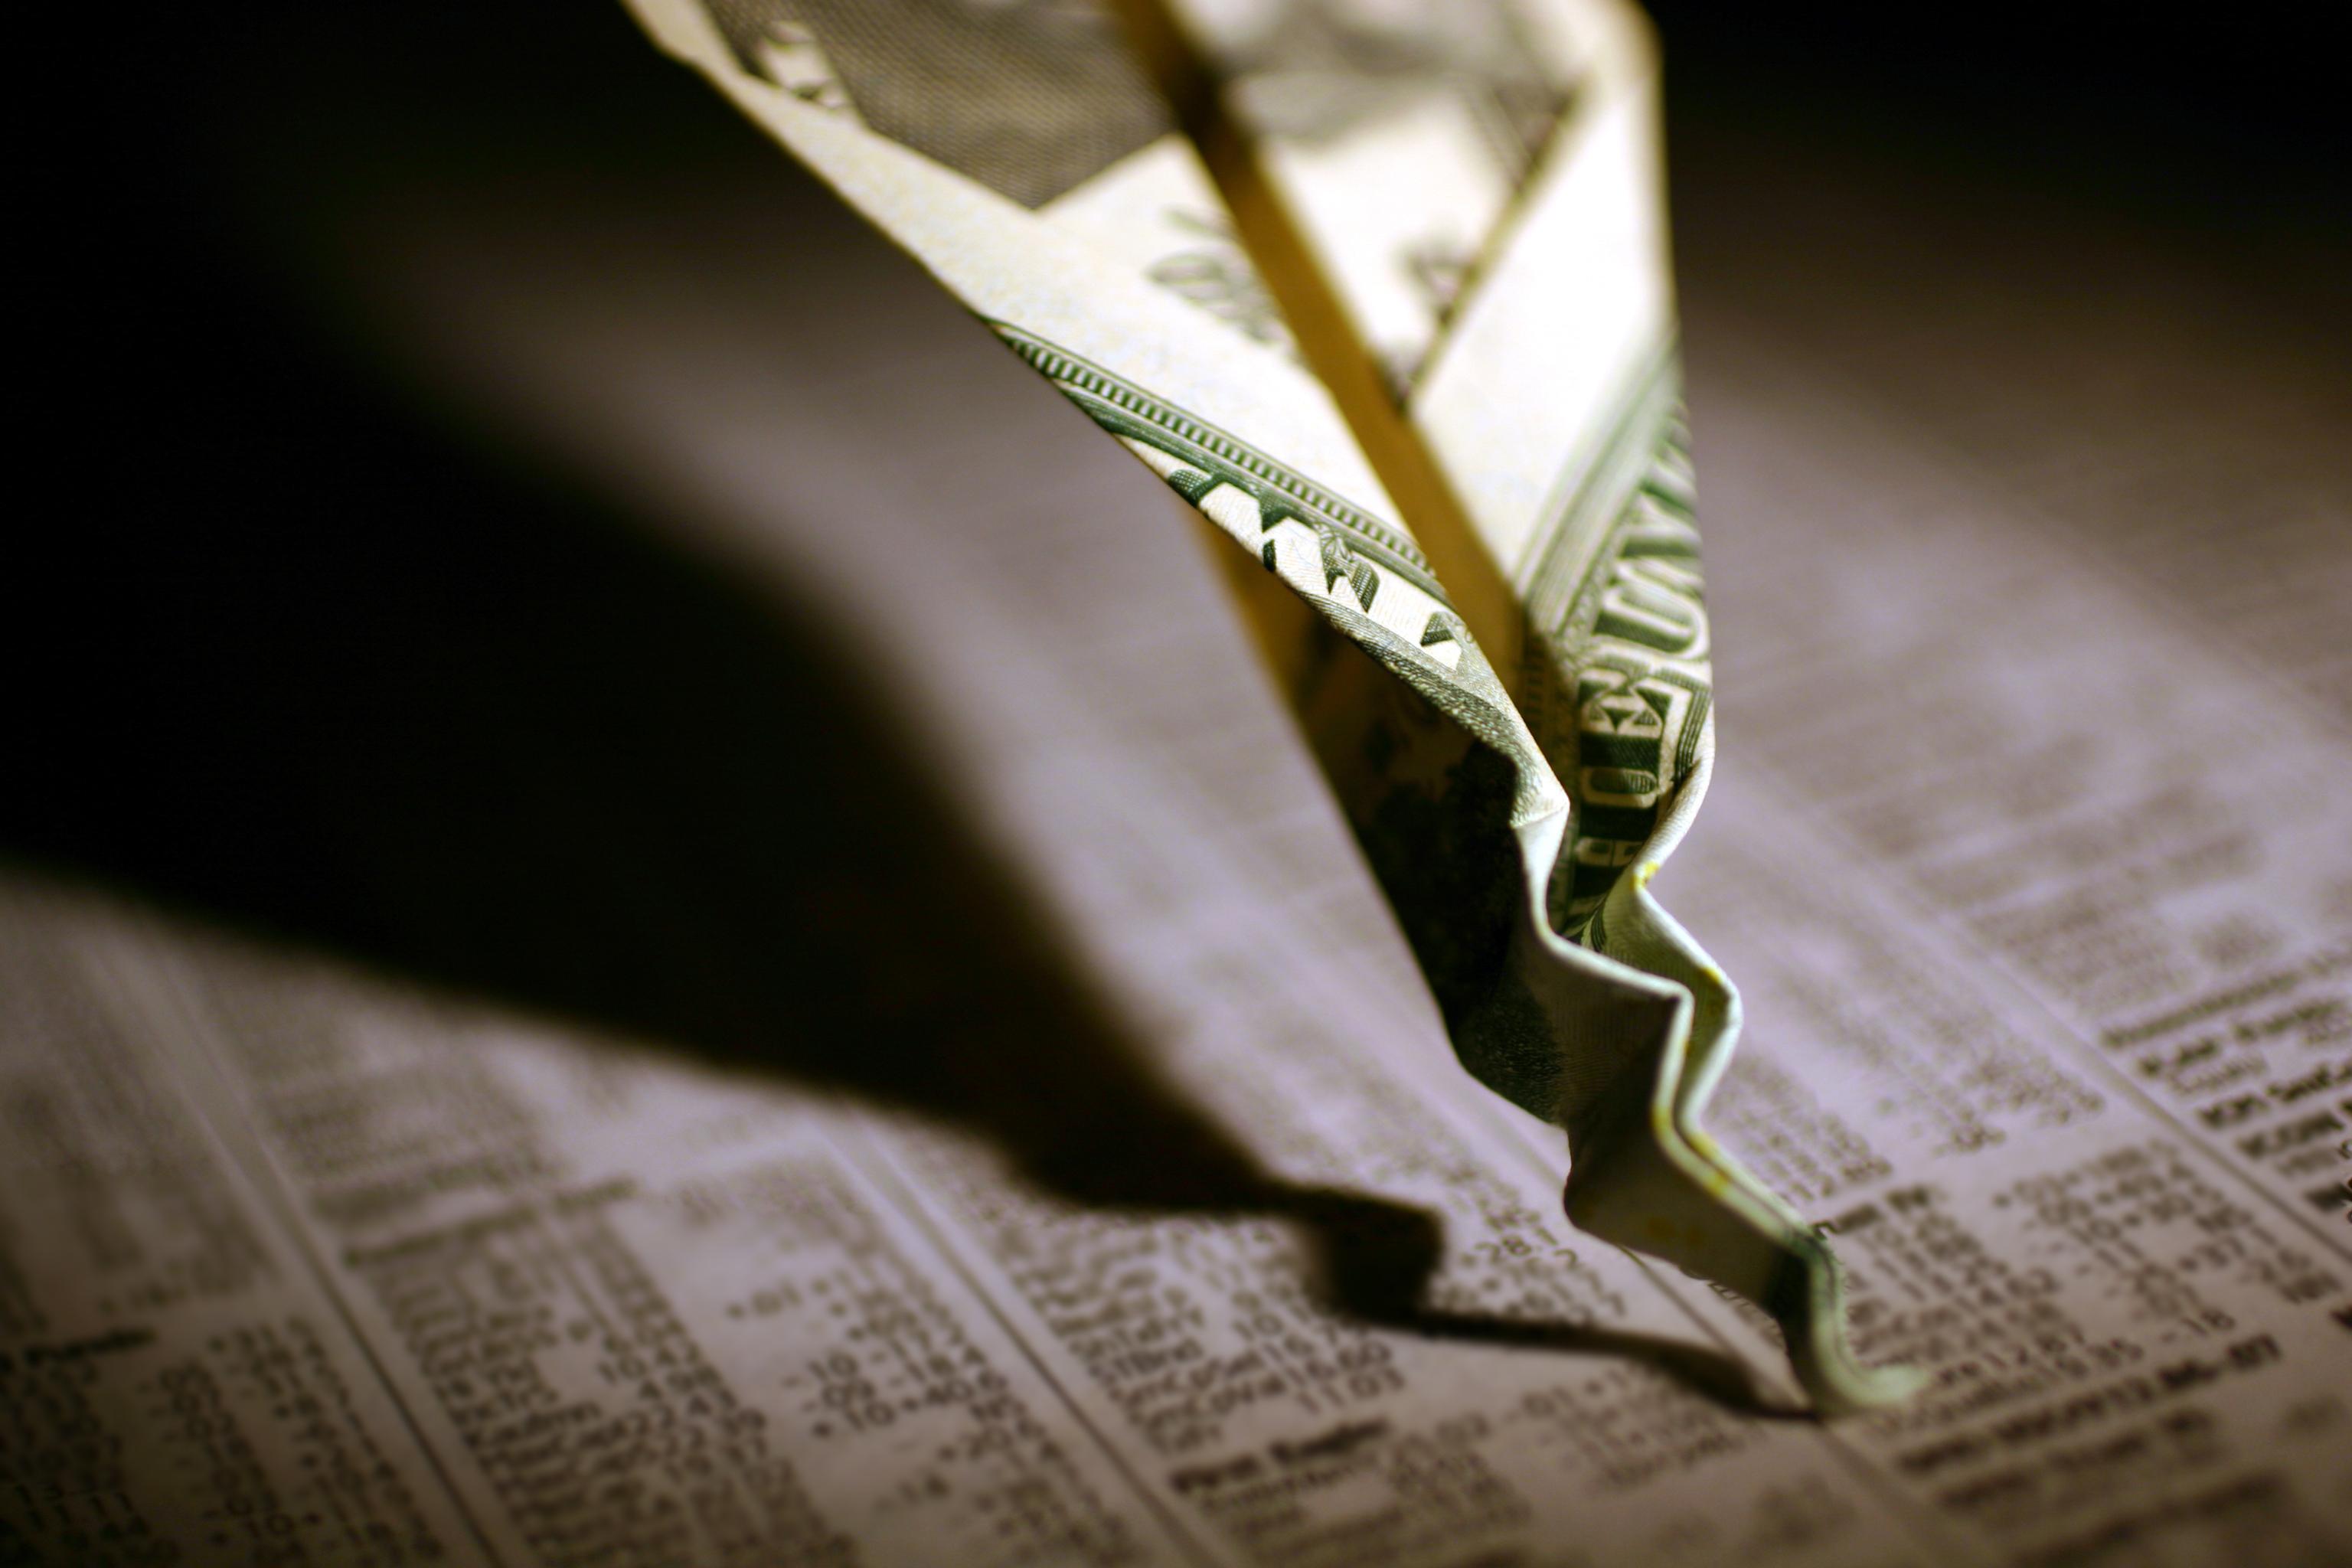 These Economic Indicators Portend a Stock Market Crash